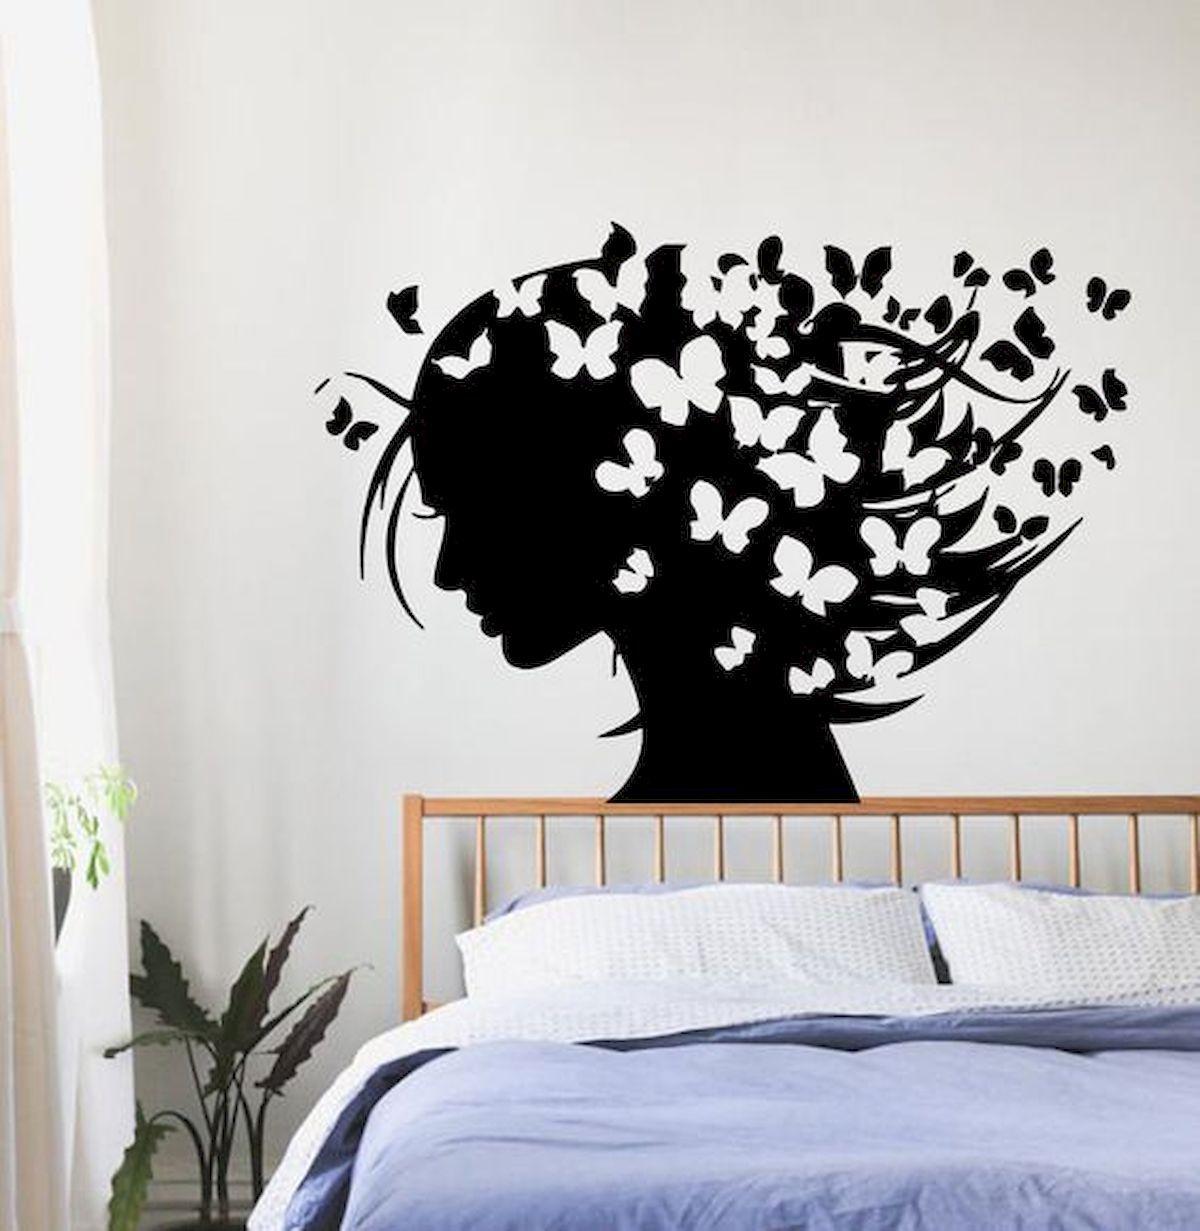 Bedroom Wall Art Designs Images Homyracks